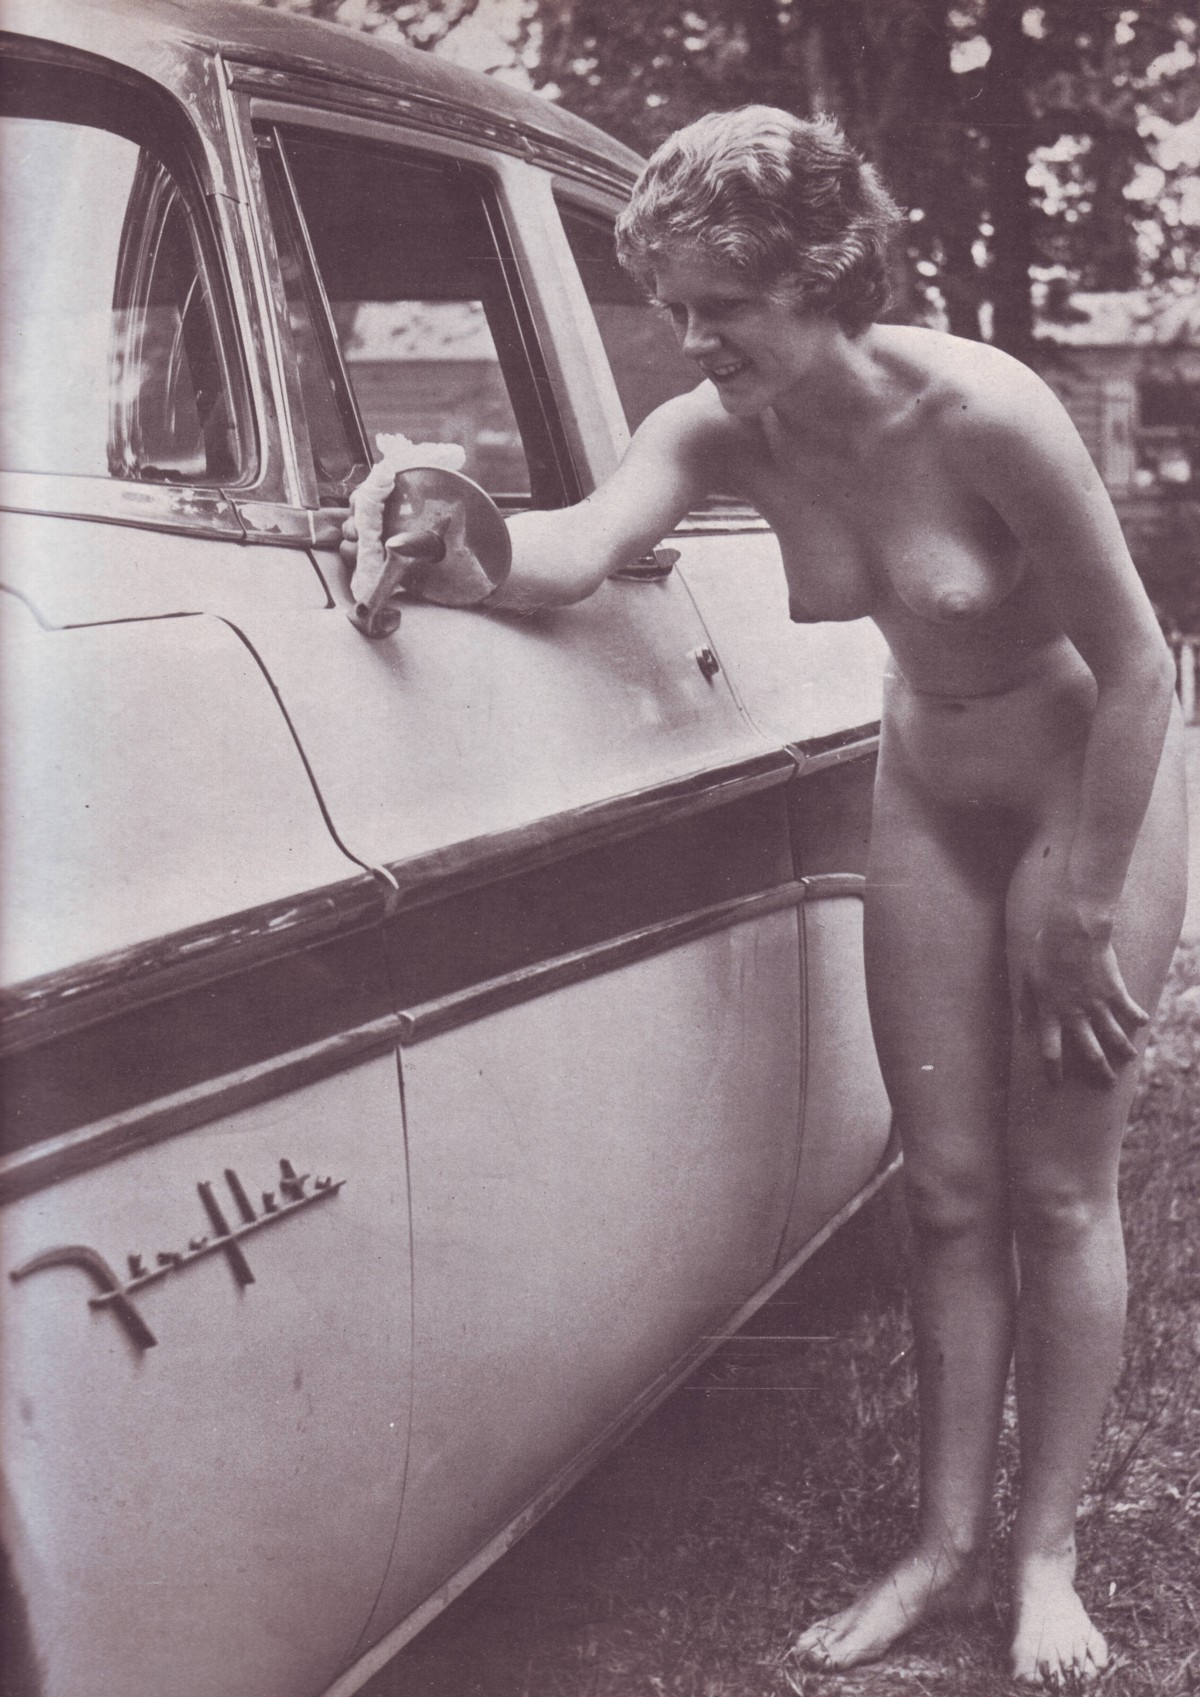 You tell Retro nudist magazine